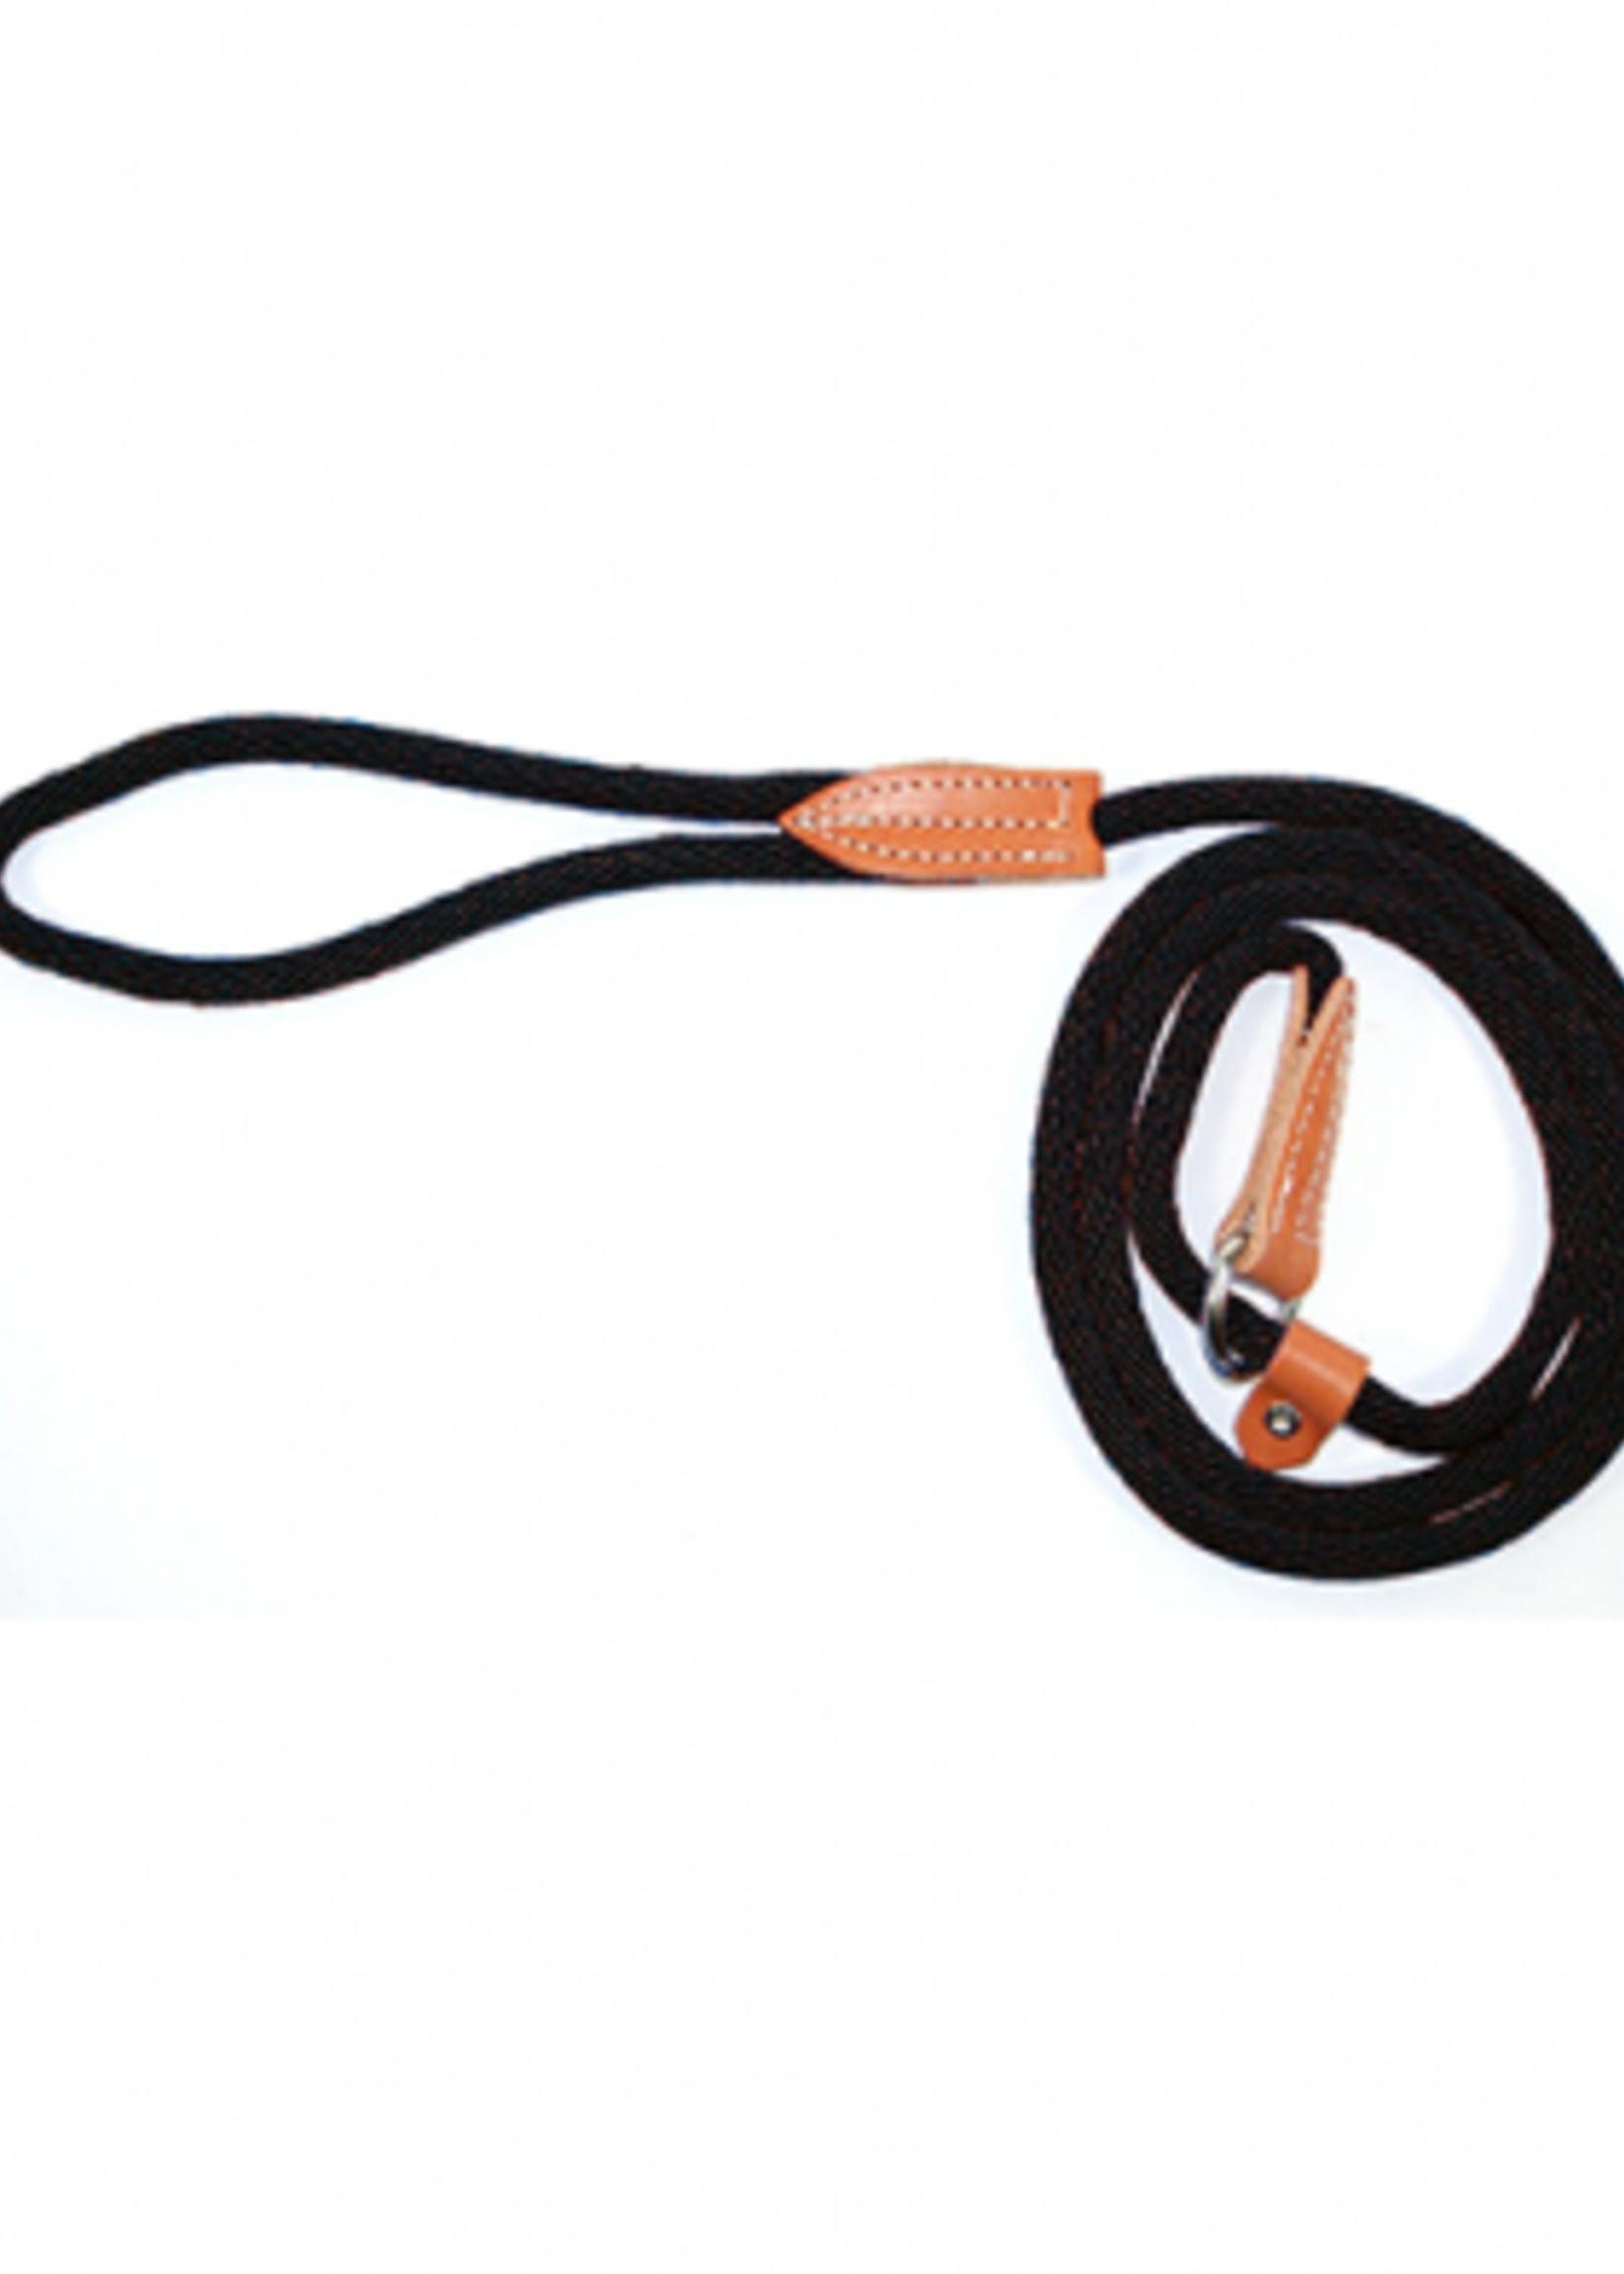 Hamilton® Quick Walker Fully Adjustable Slip Leash 6'